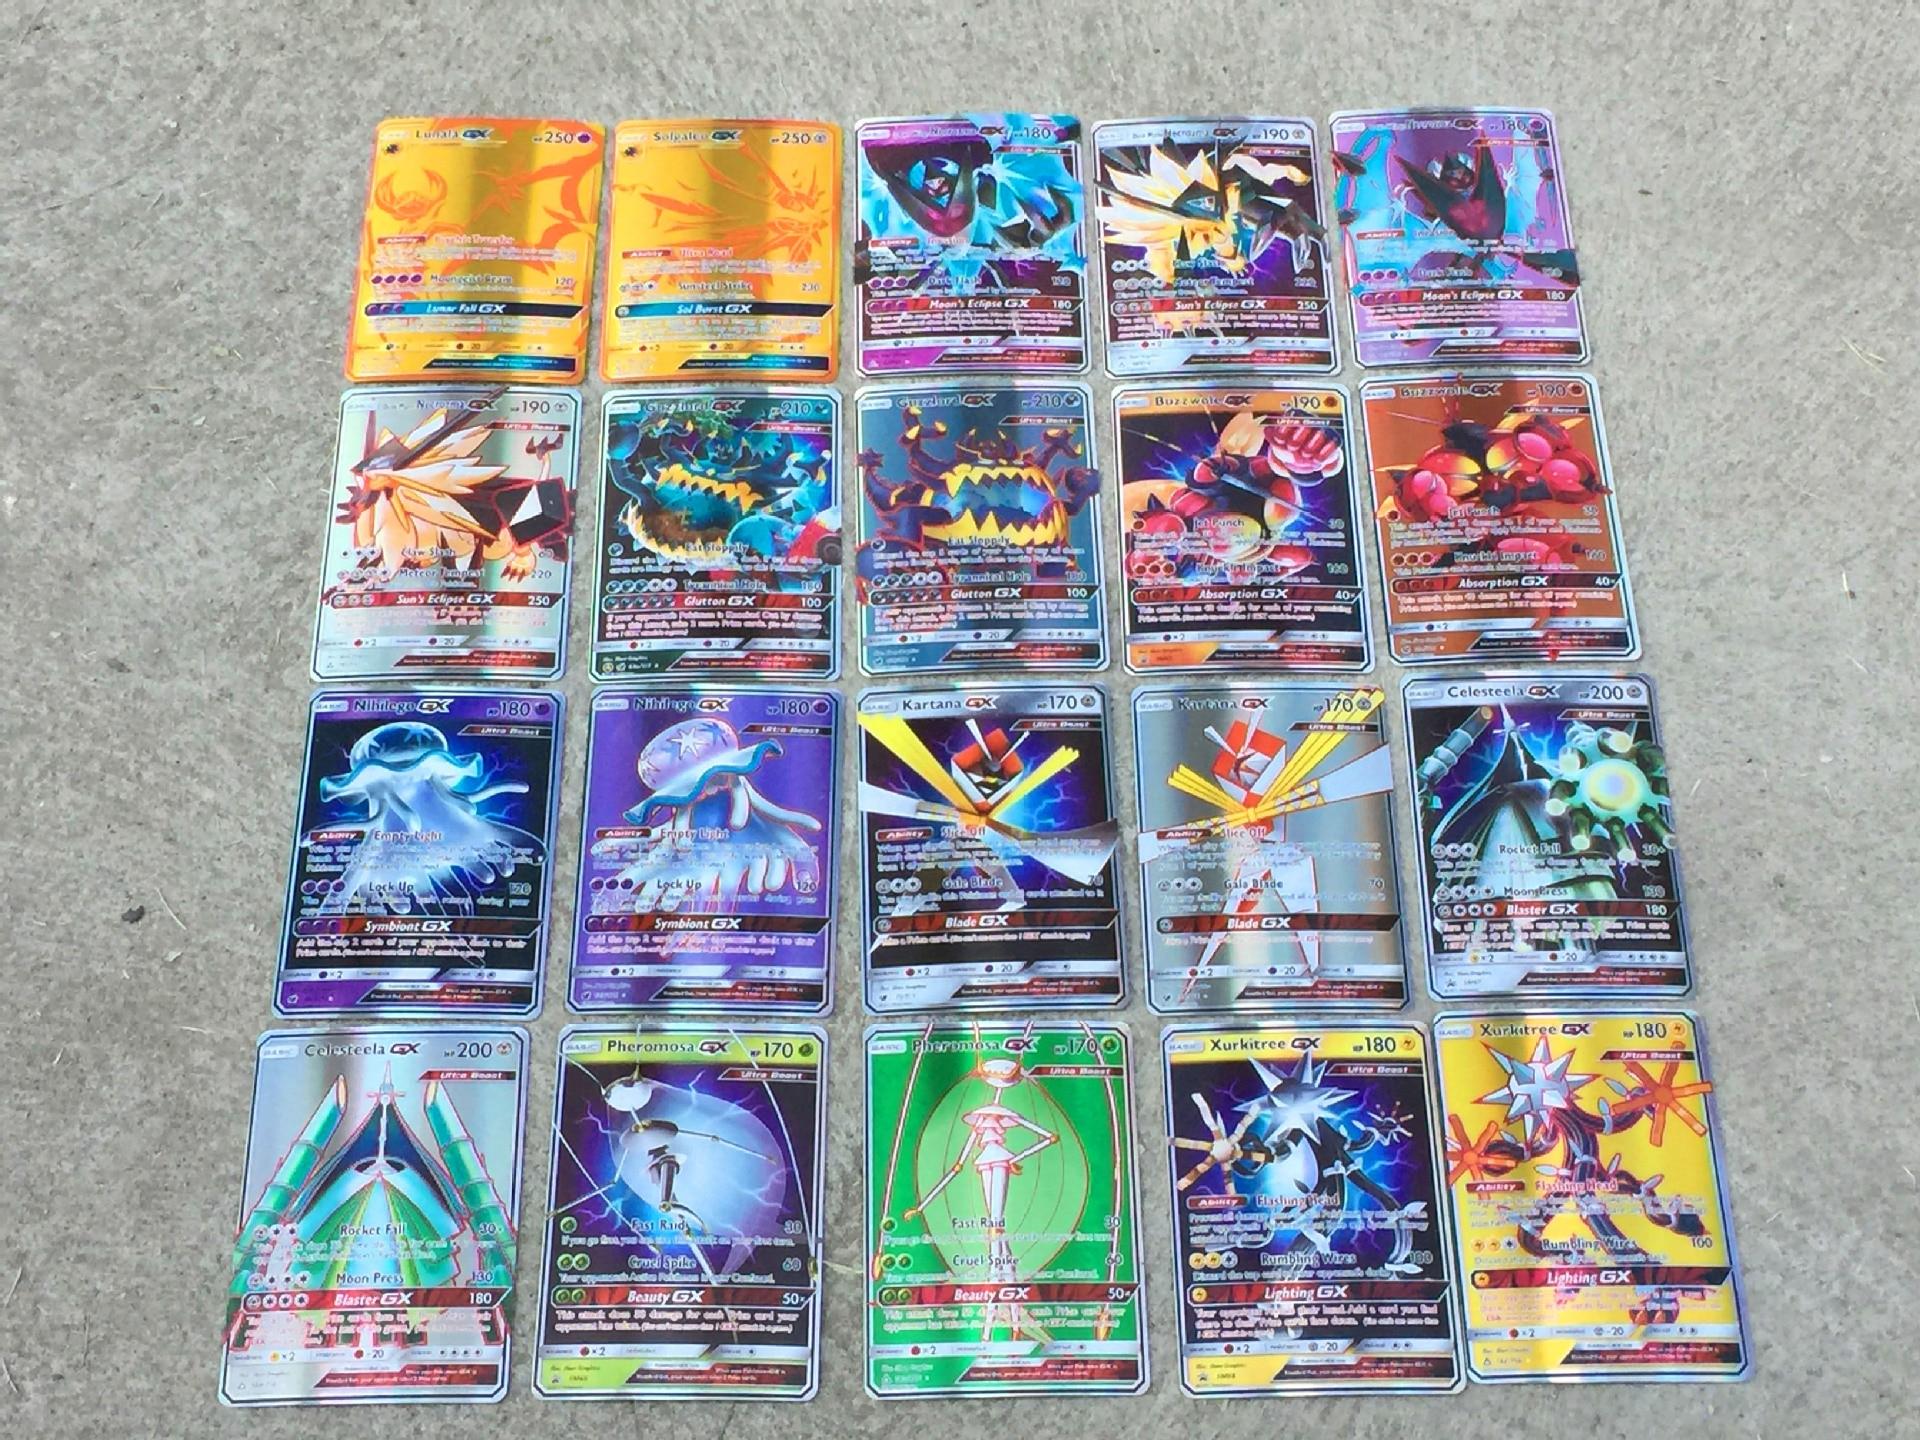 TAKARA TOMY 25  50 Stuks GX MEGA Shining Kaarten Game Battle Carte Trading Pokemon Cards Kinderen Speelgoed